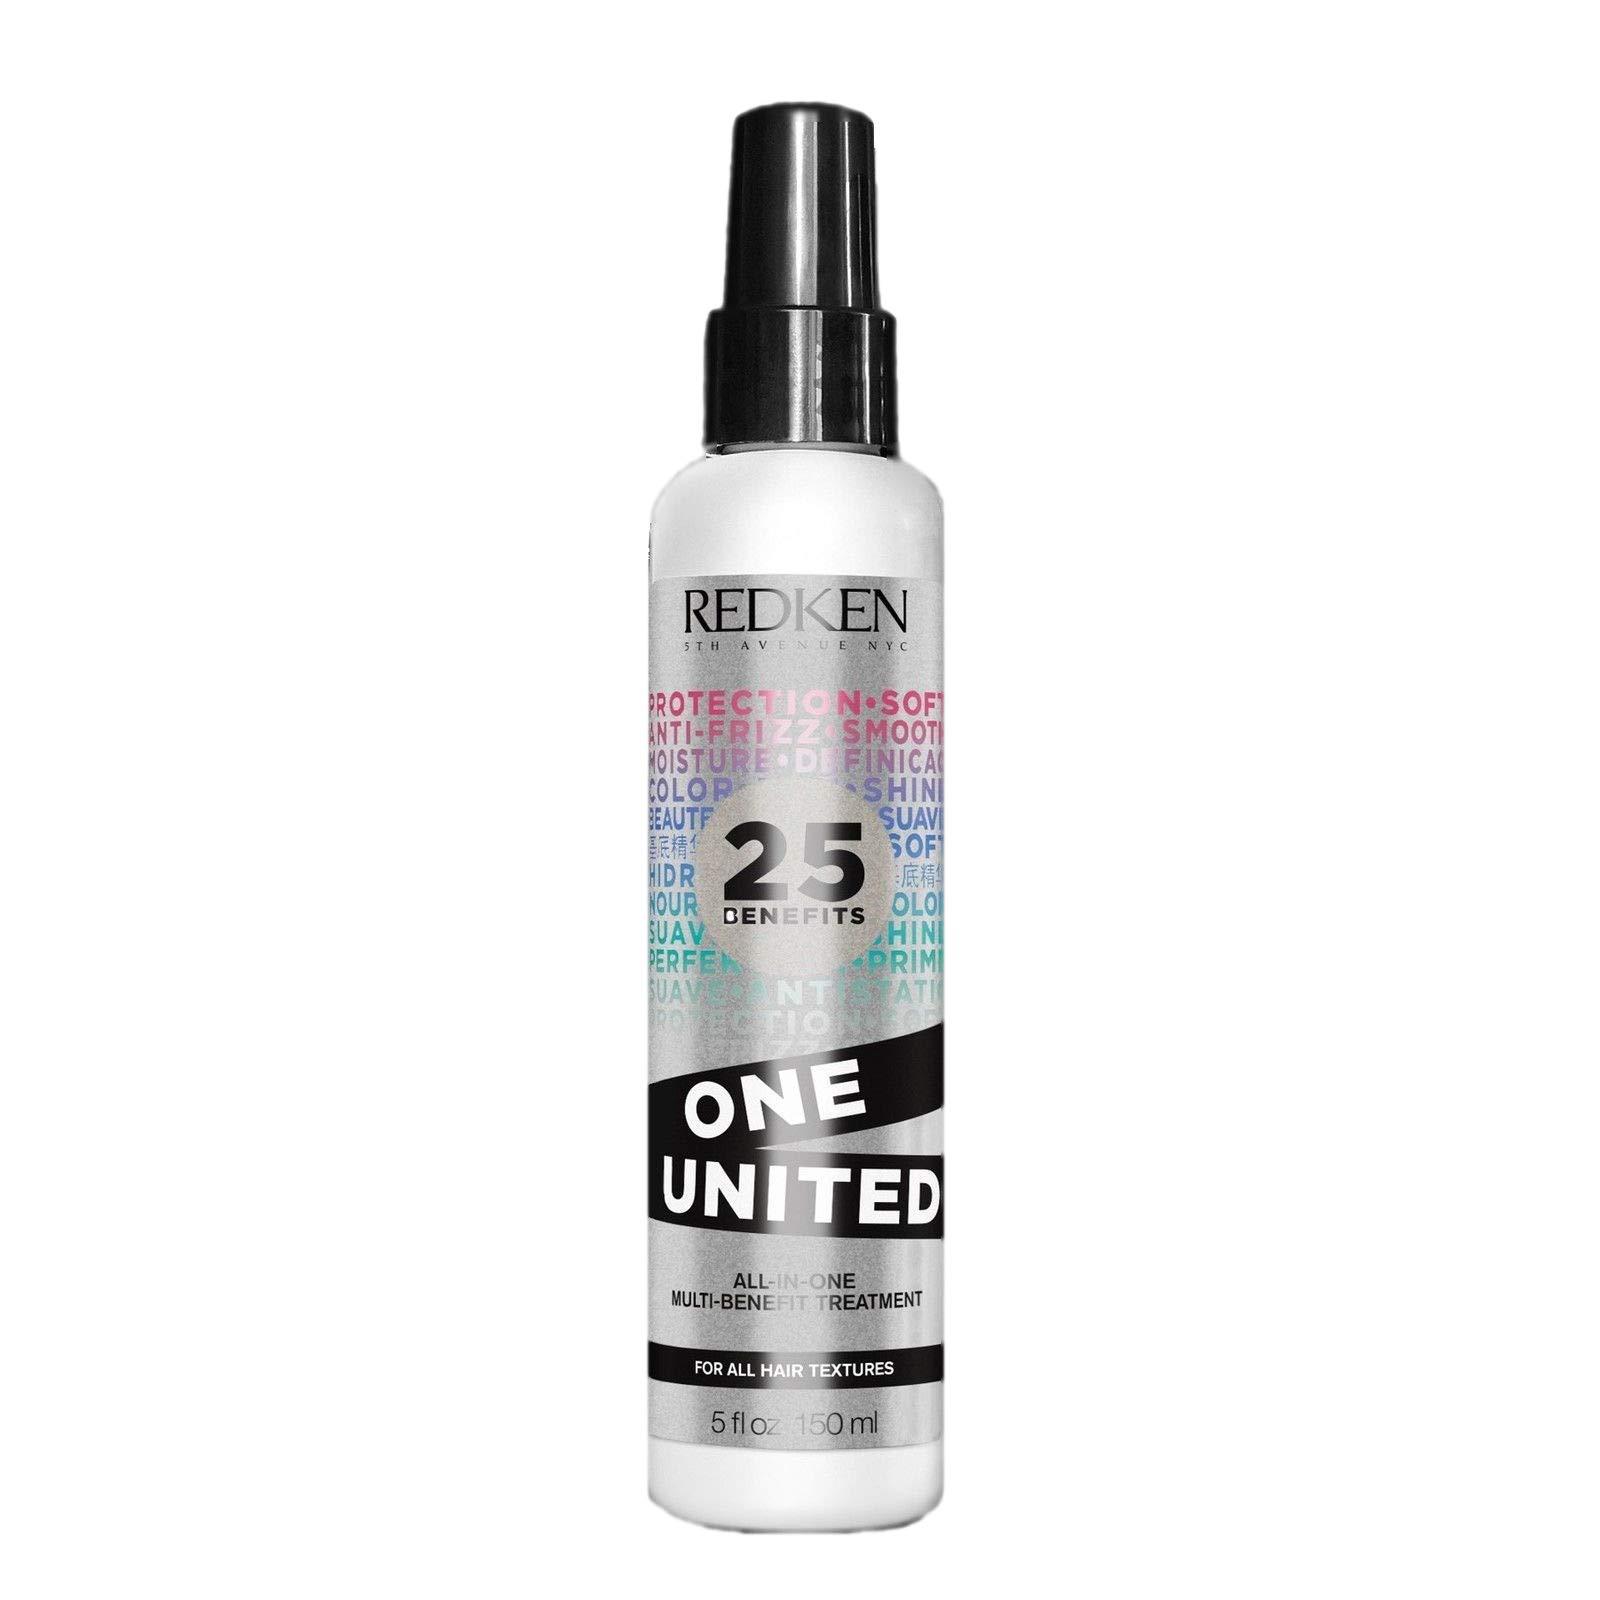 Redken Unisex One United Multi Benefit Hair Treatment, 5 Fl. Oz by REDKEN